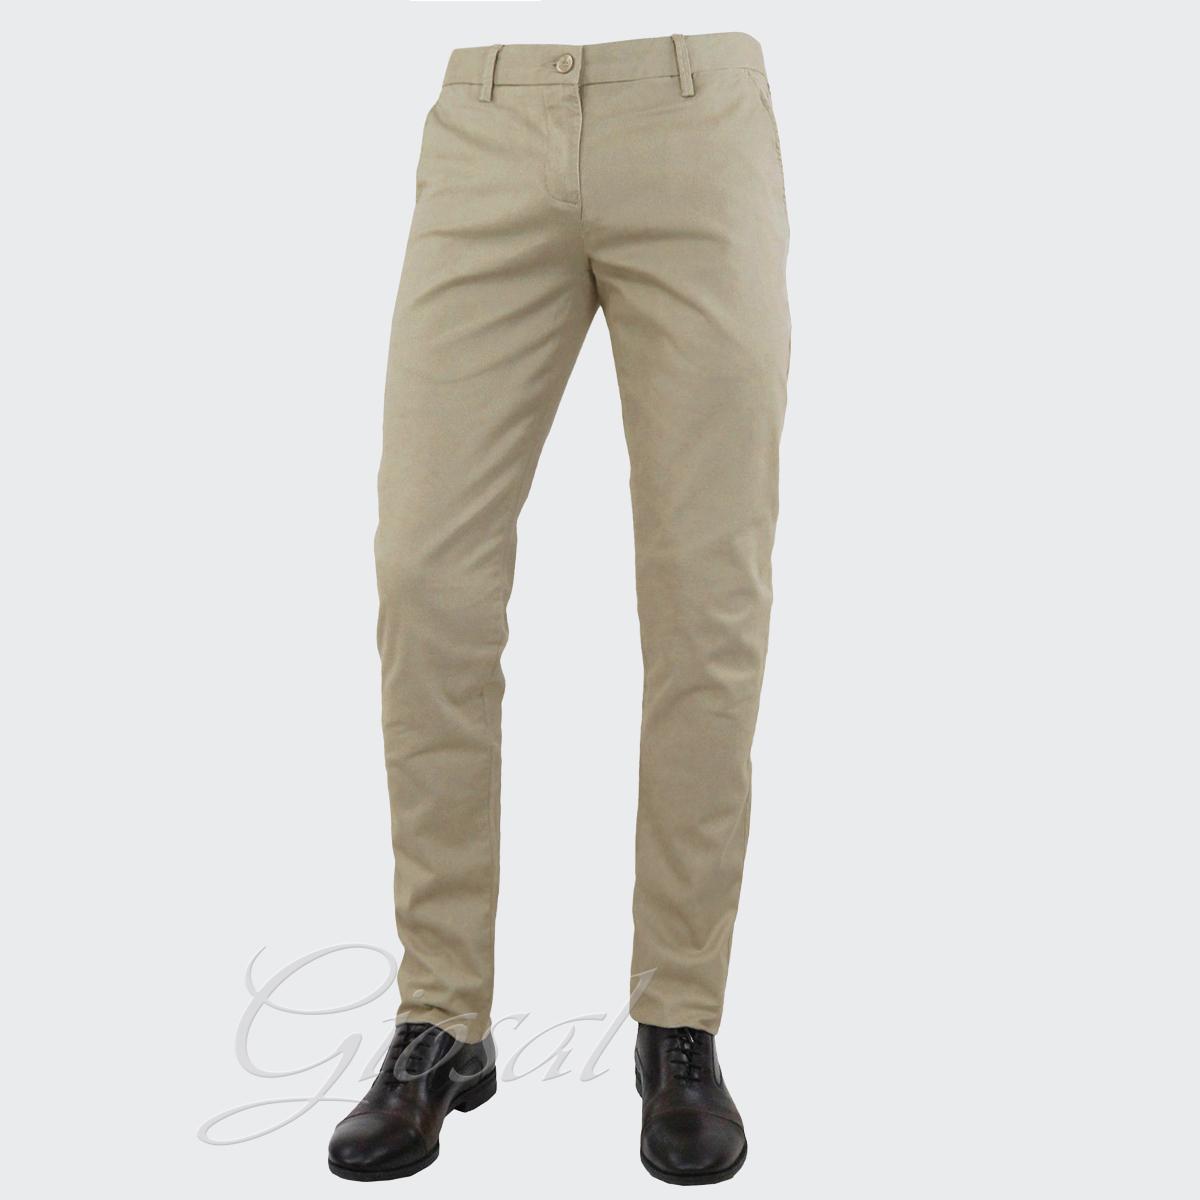 Pantalone-Uomo-Tasca-America-Slim-Cotone-Chino-Elastico-Colori-Vari-GIOSAL miniatura 8